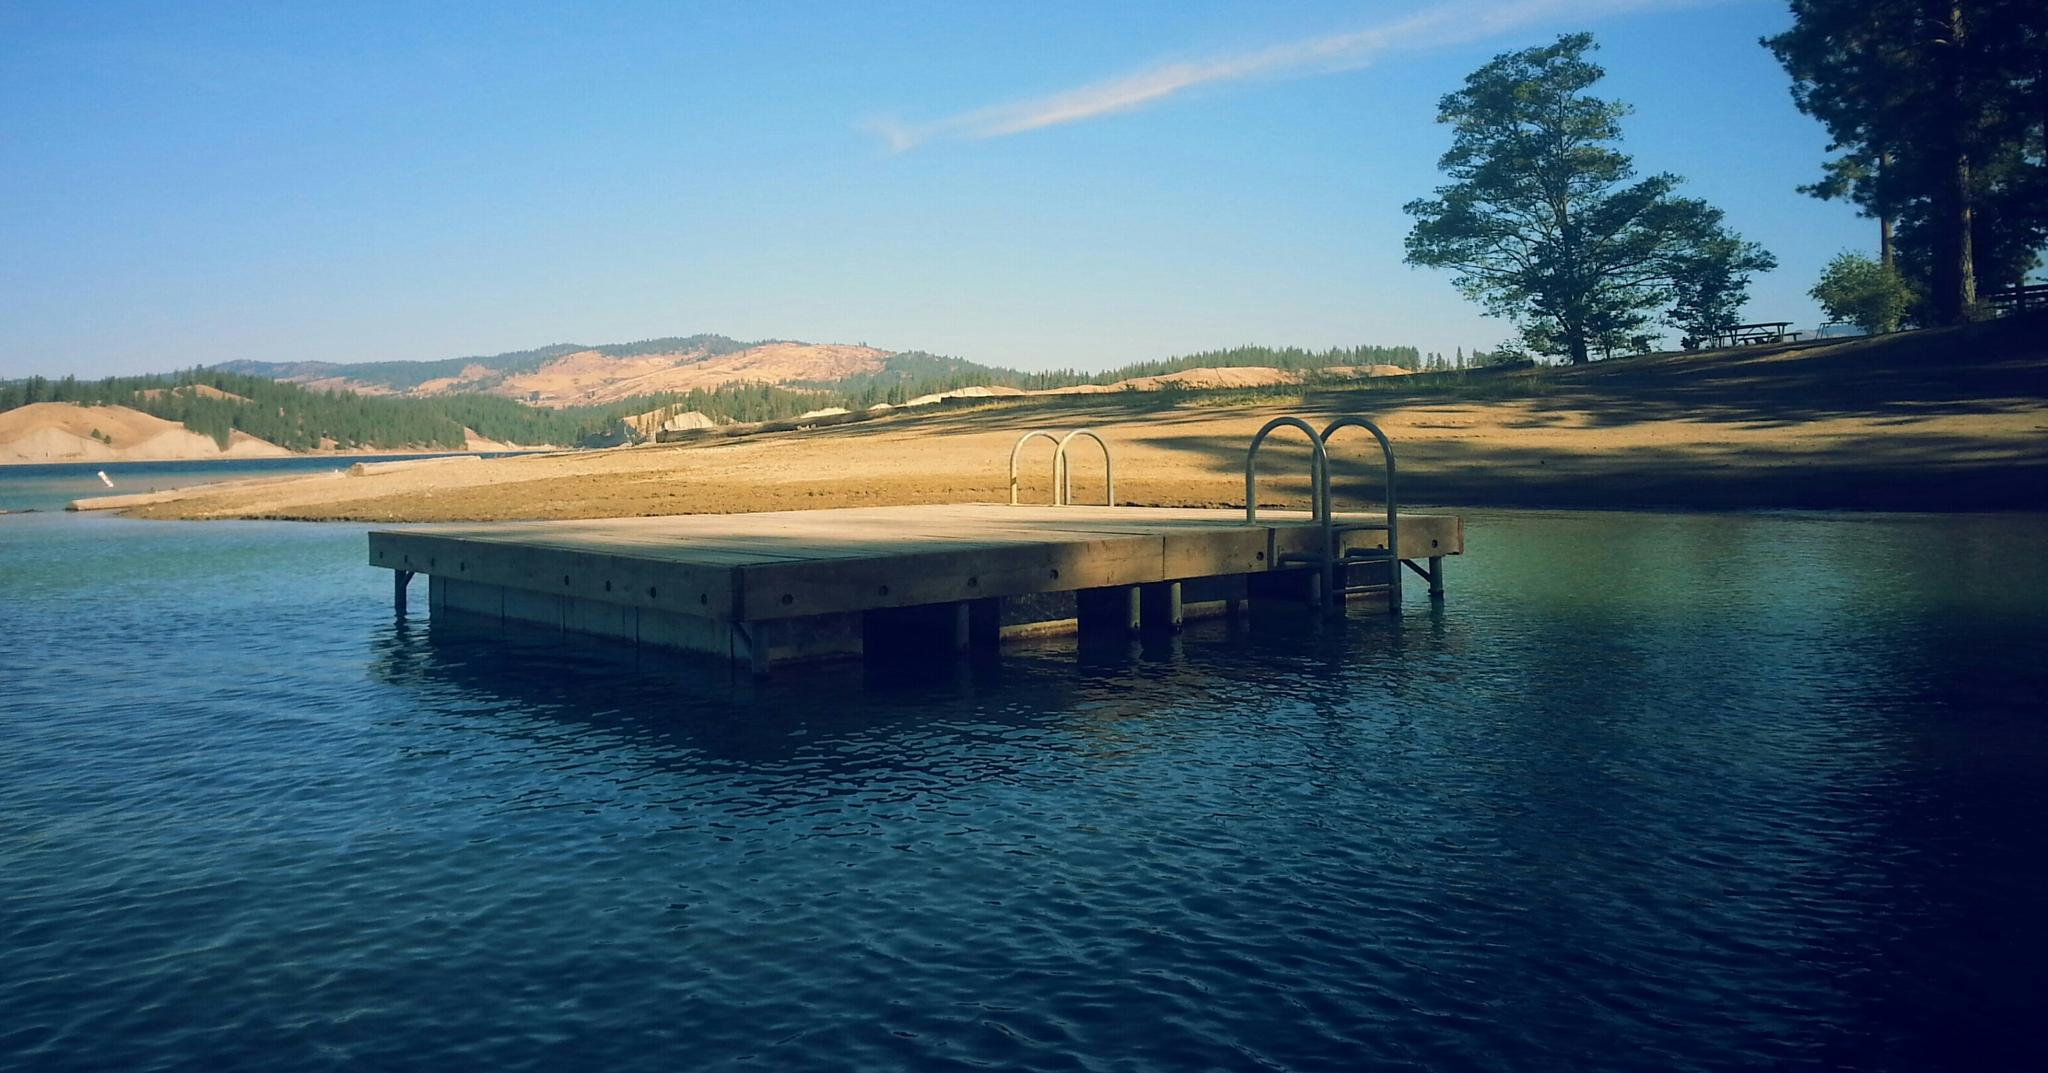 awaiting dock by dawn.brown.7927